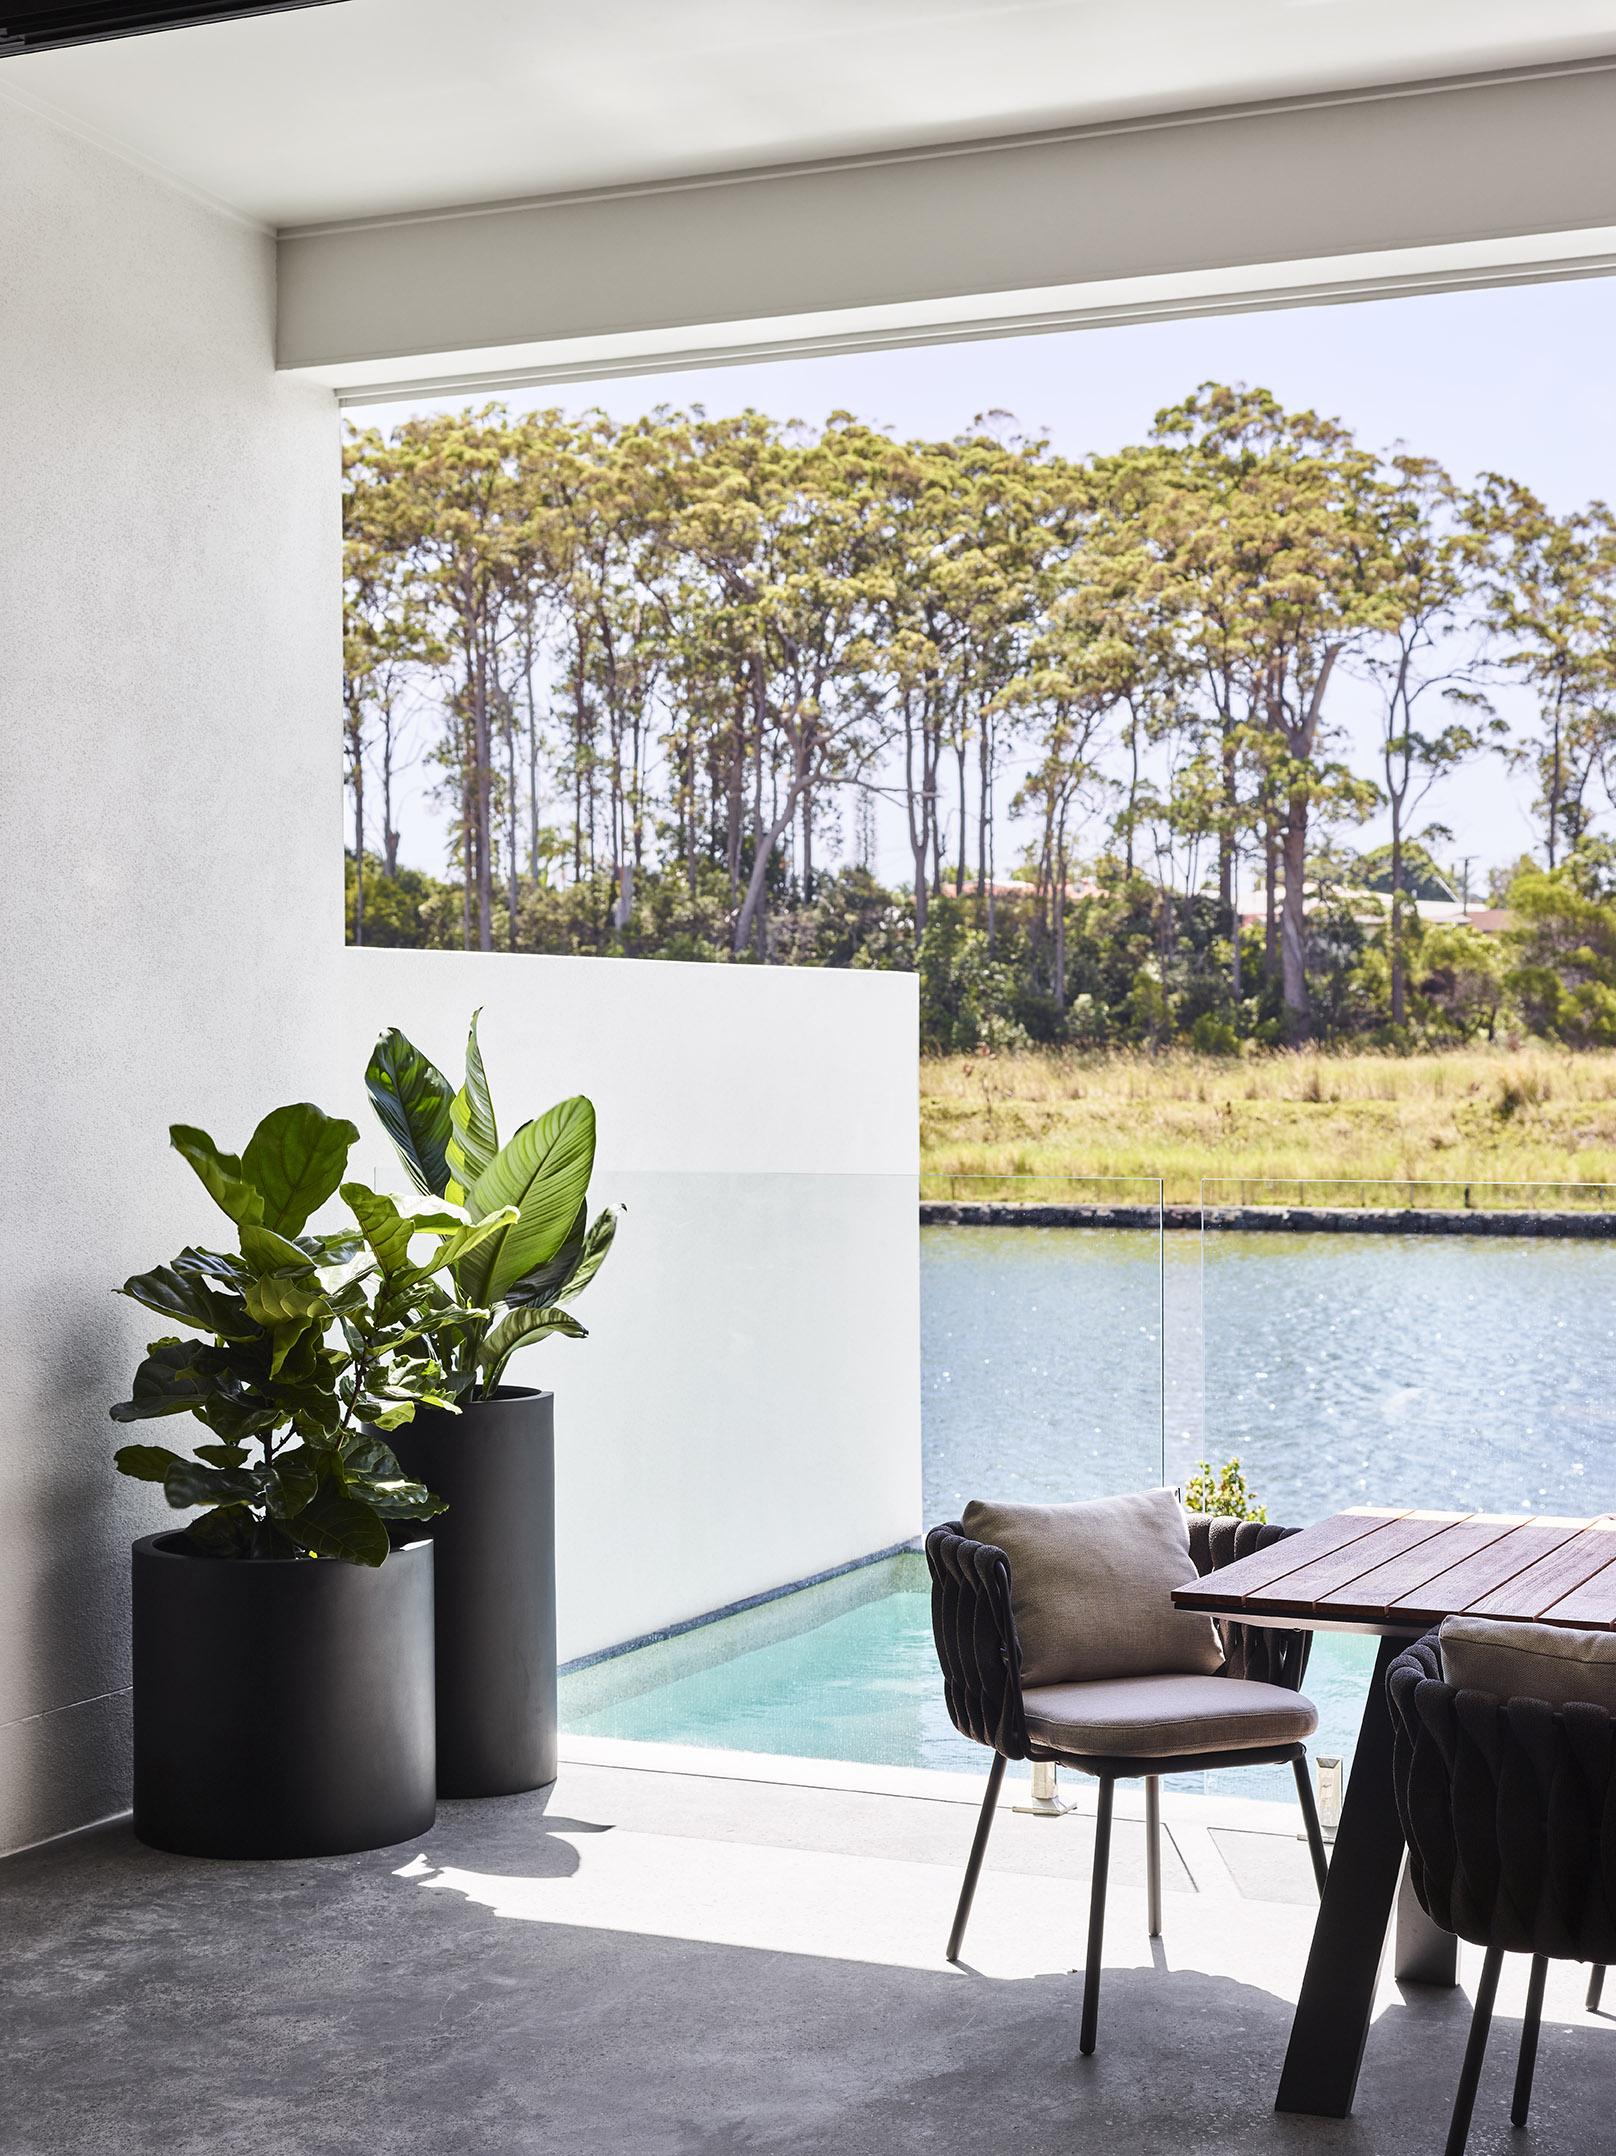 Langsford Cres House - Maytres Studios69296.jpg